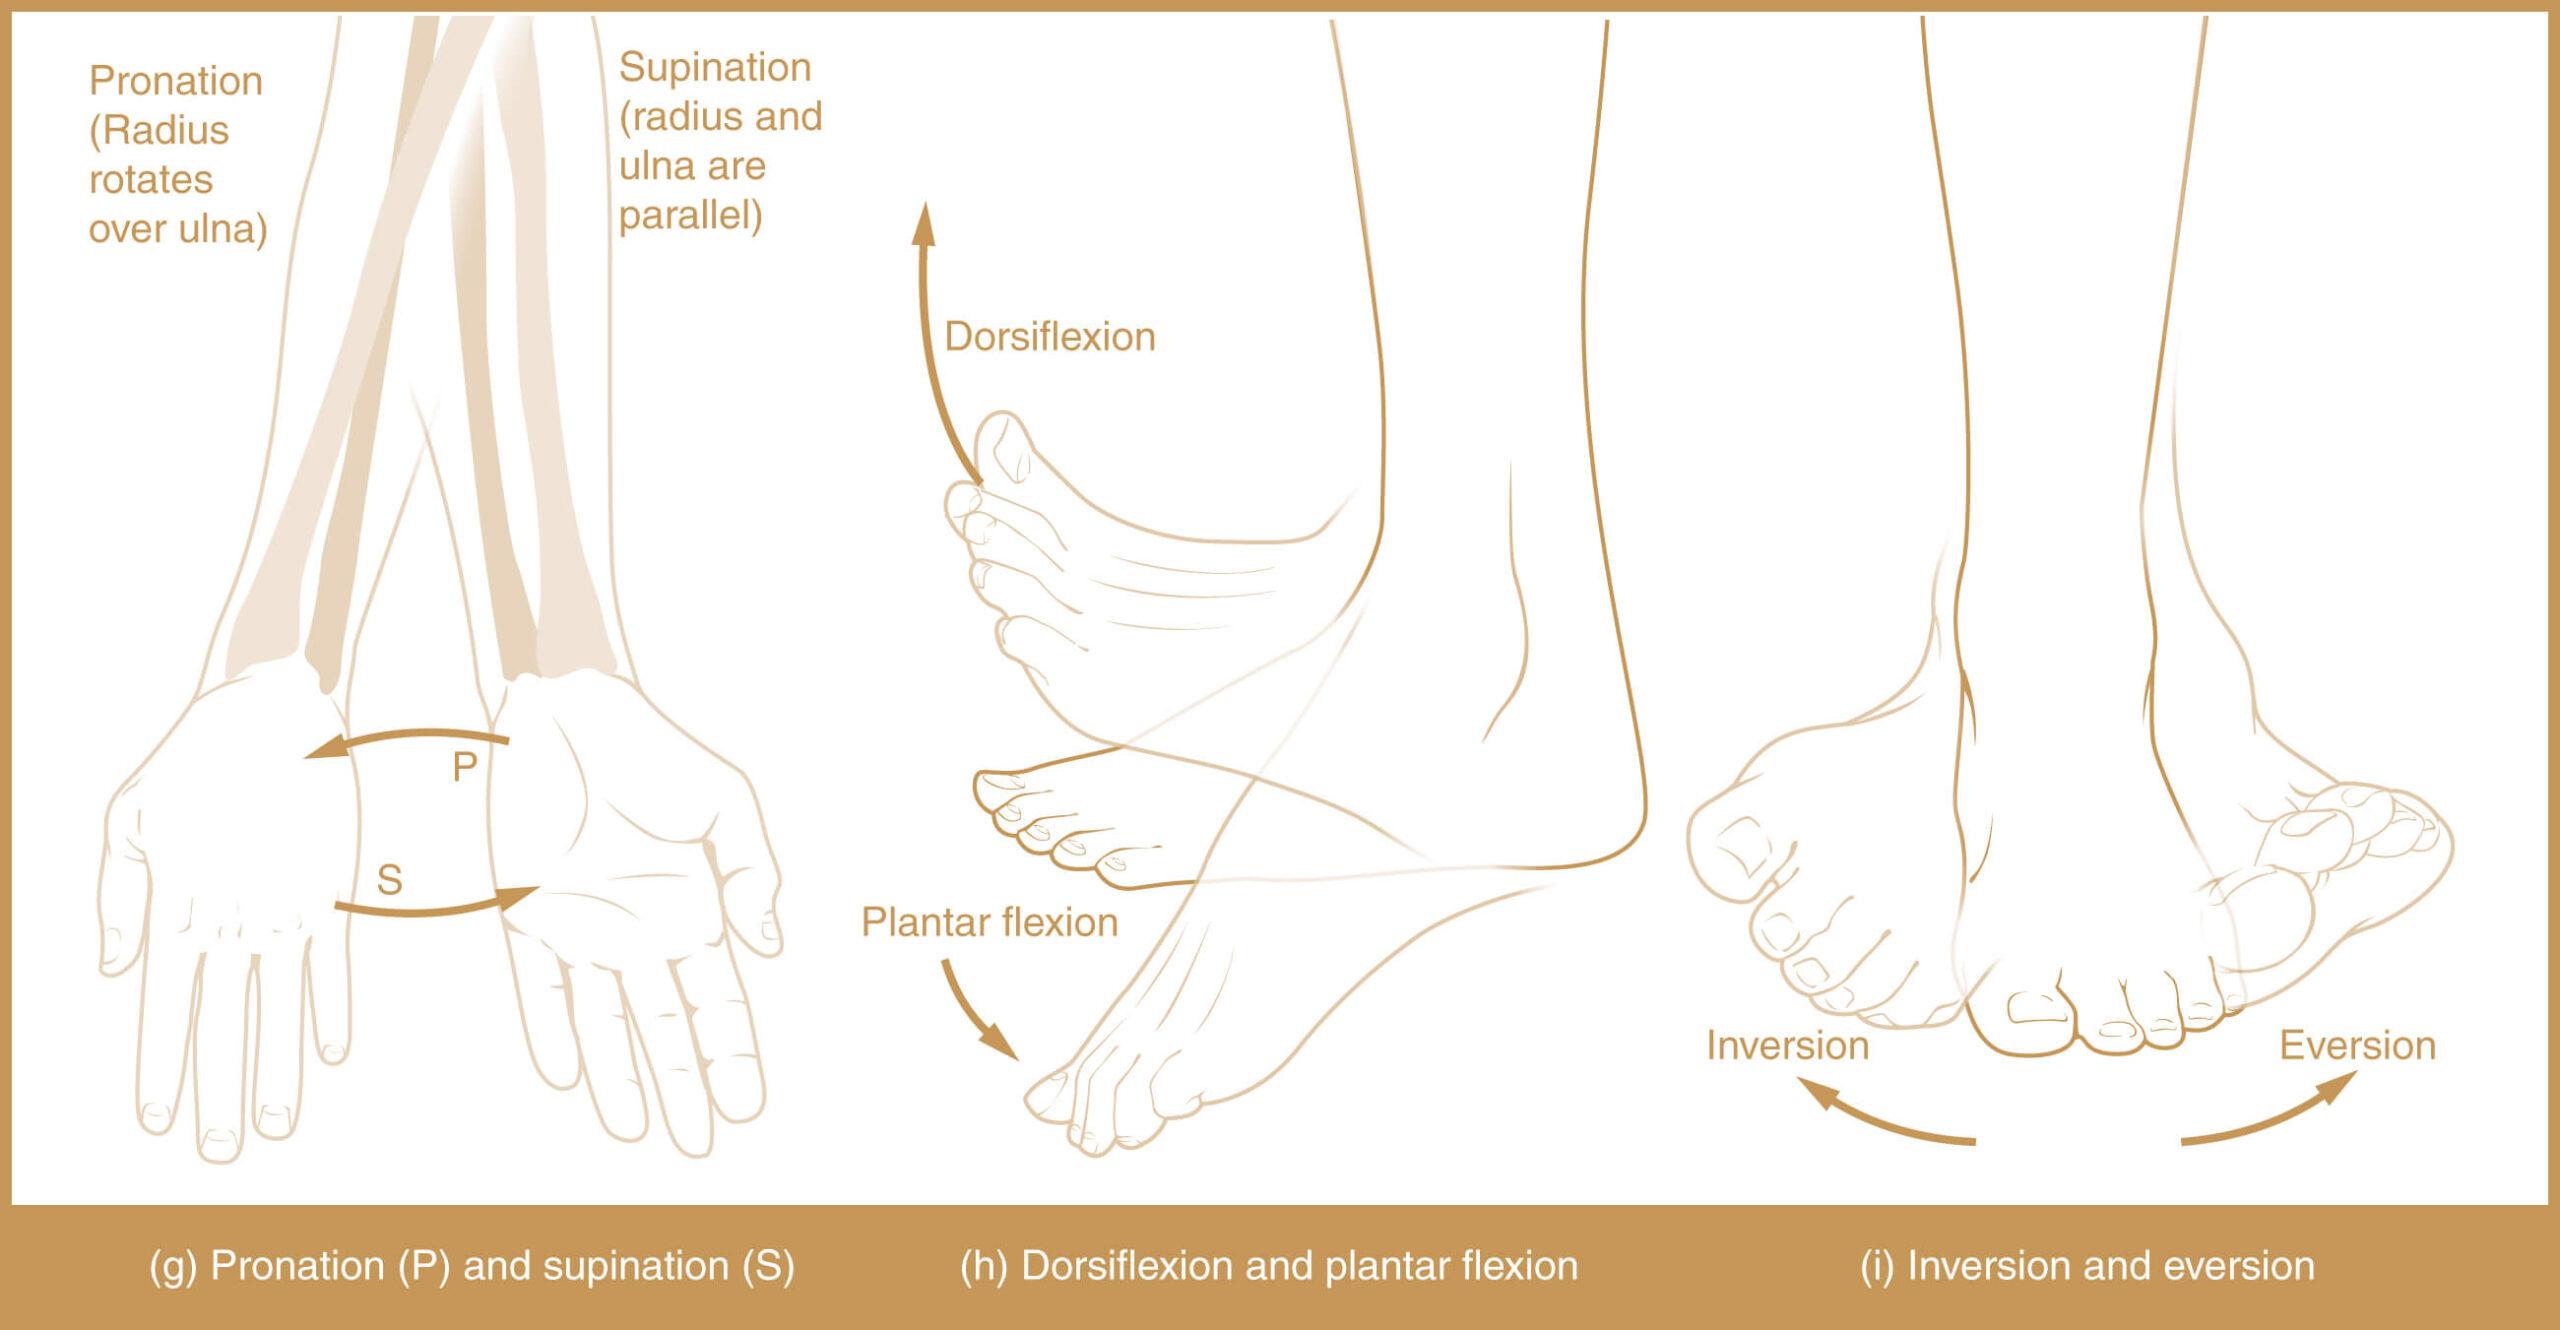 Types of Body Movement - Supination, Pronation, Plantar flexion, Dorsiflexion, Inversion, Eversion